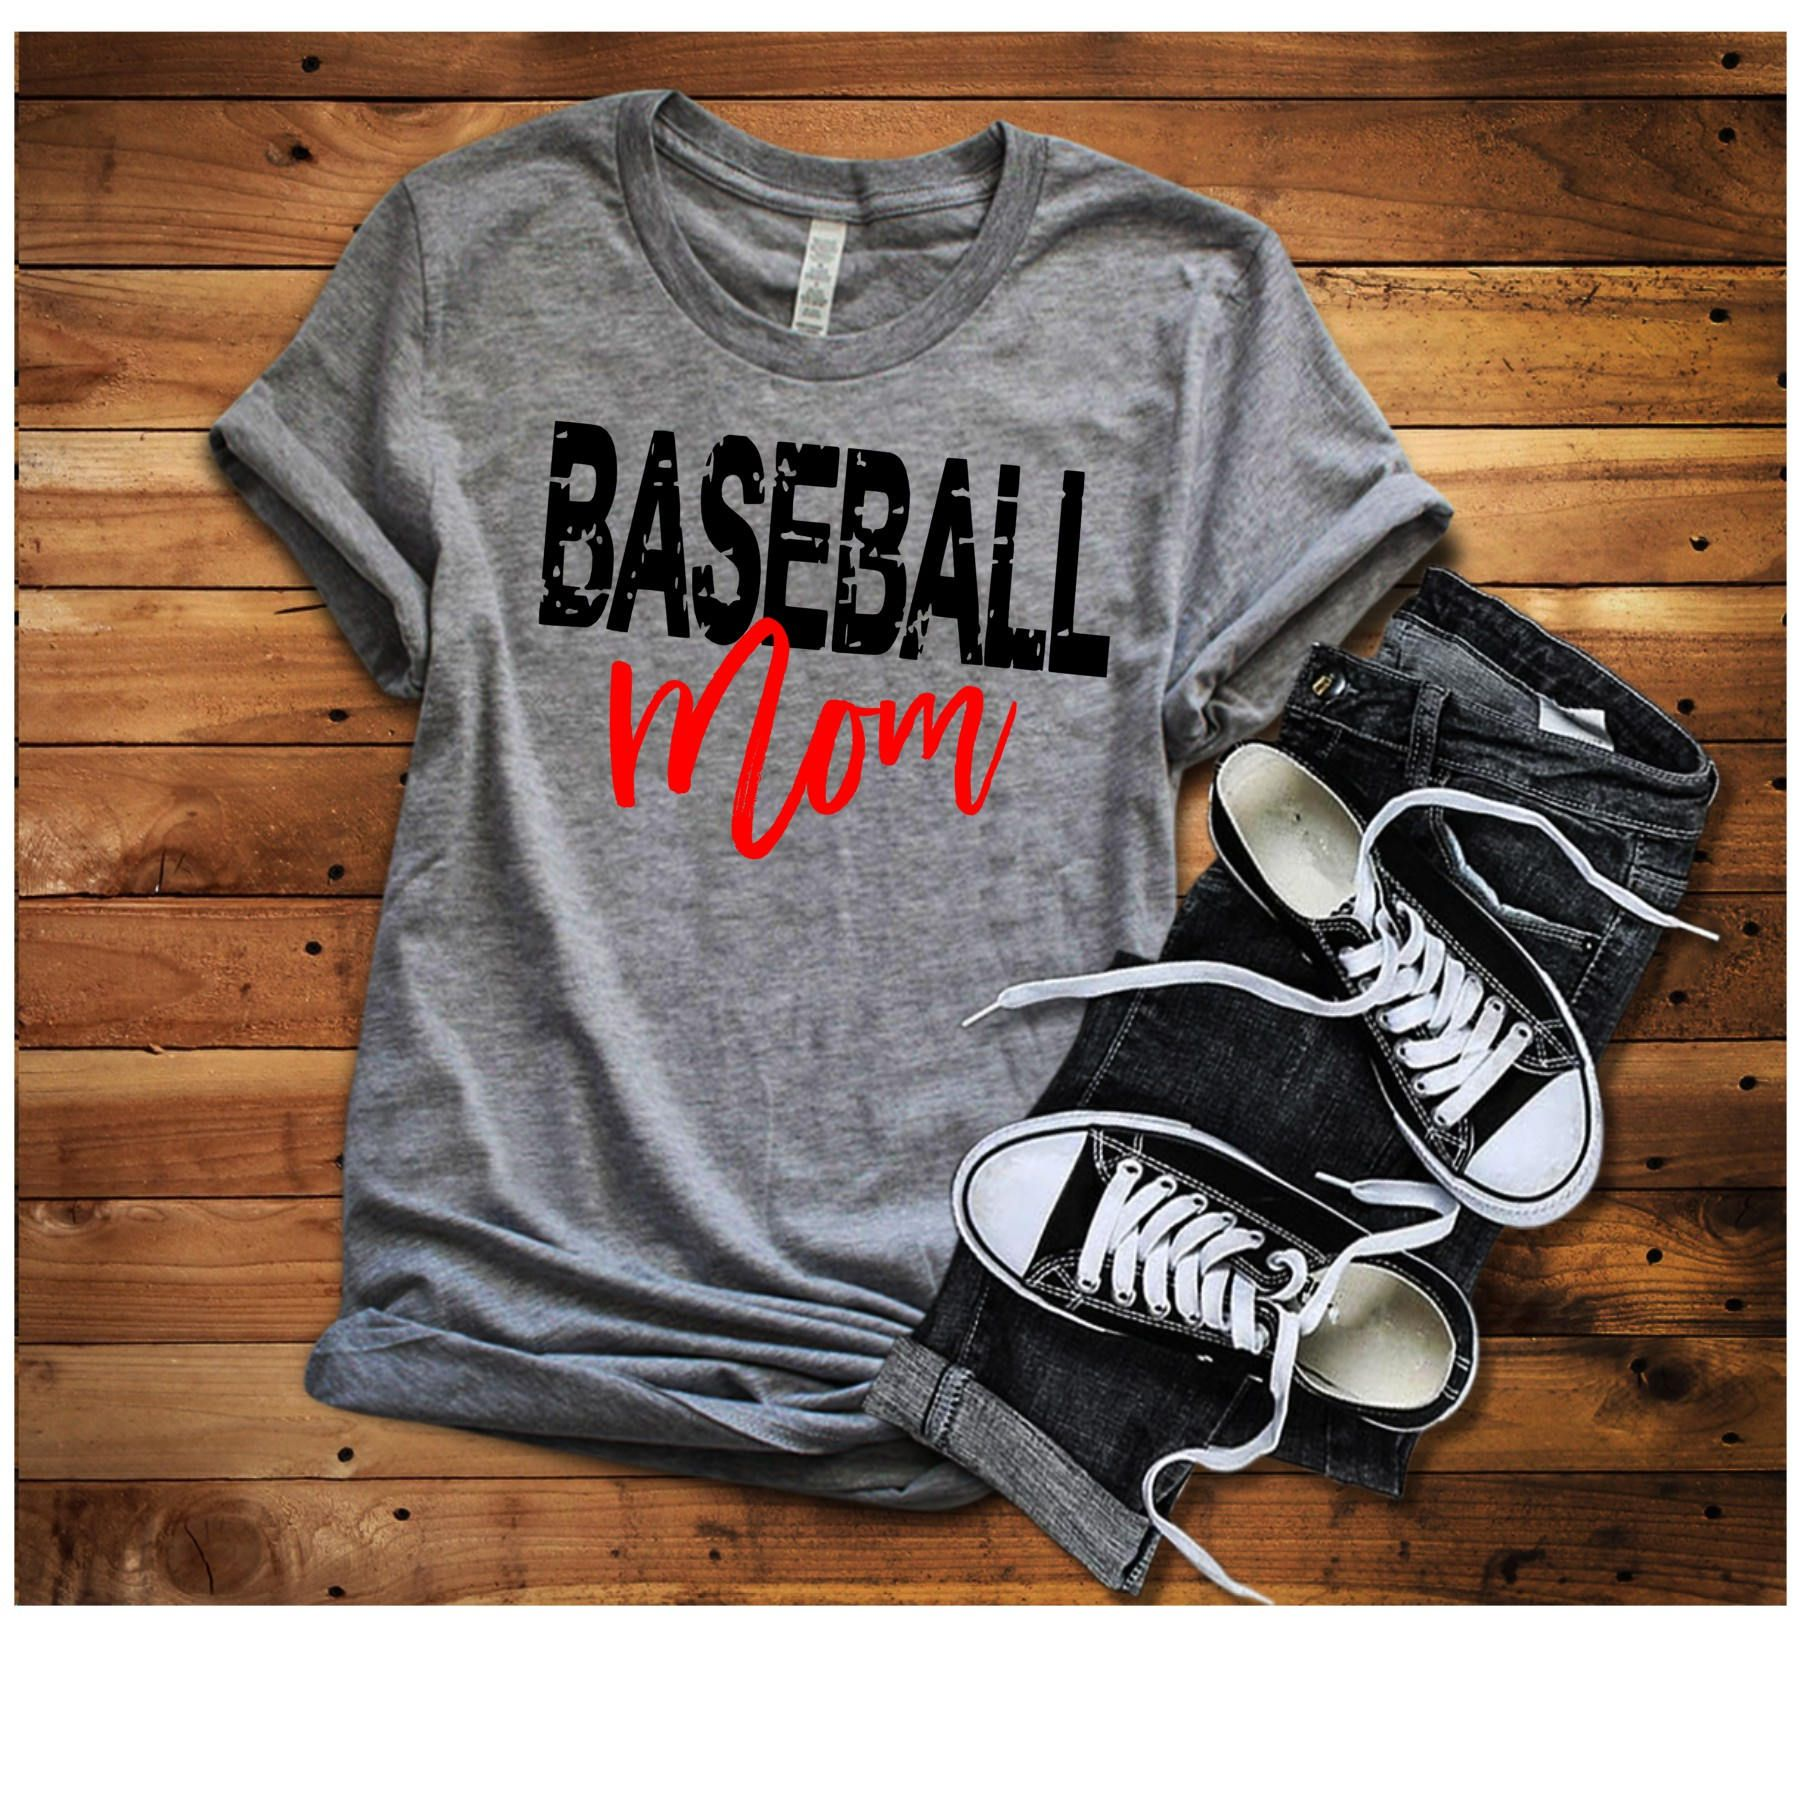 ef14be49 Baseball Mom Shirt, Baseball Shirt, Woman's Baseball Shirt, Baseball  Grandma Shirt, Baseball